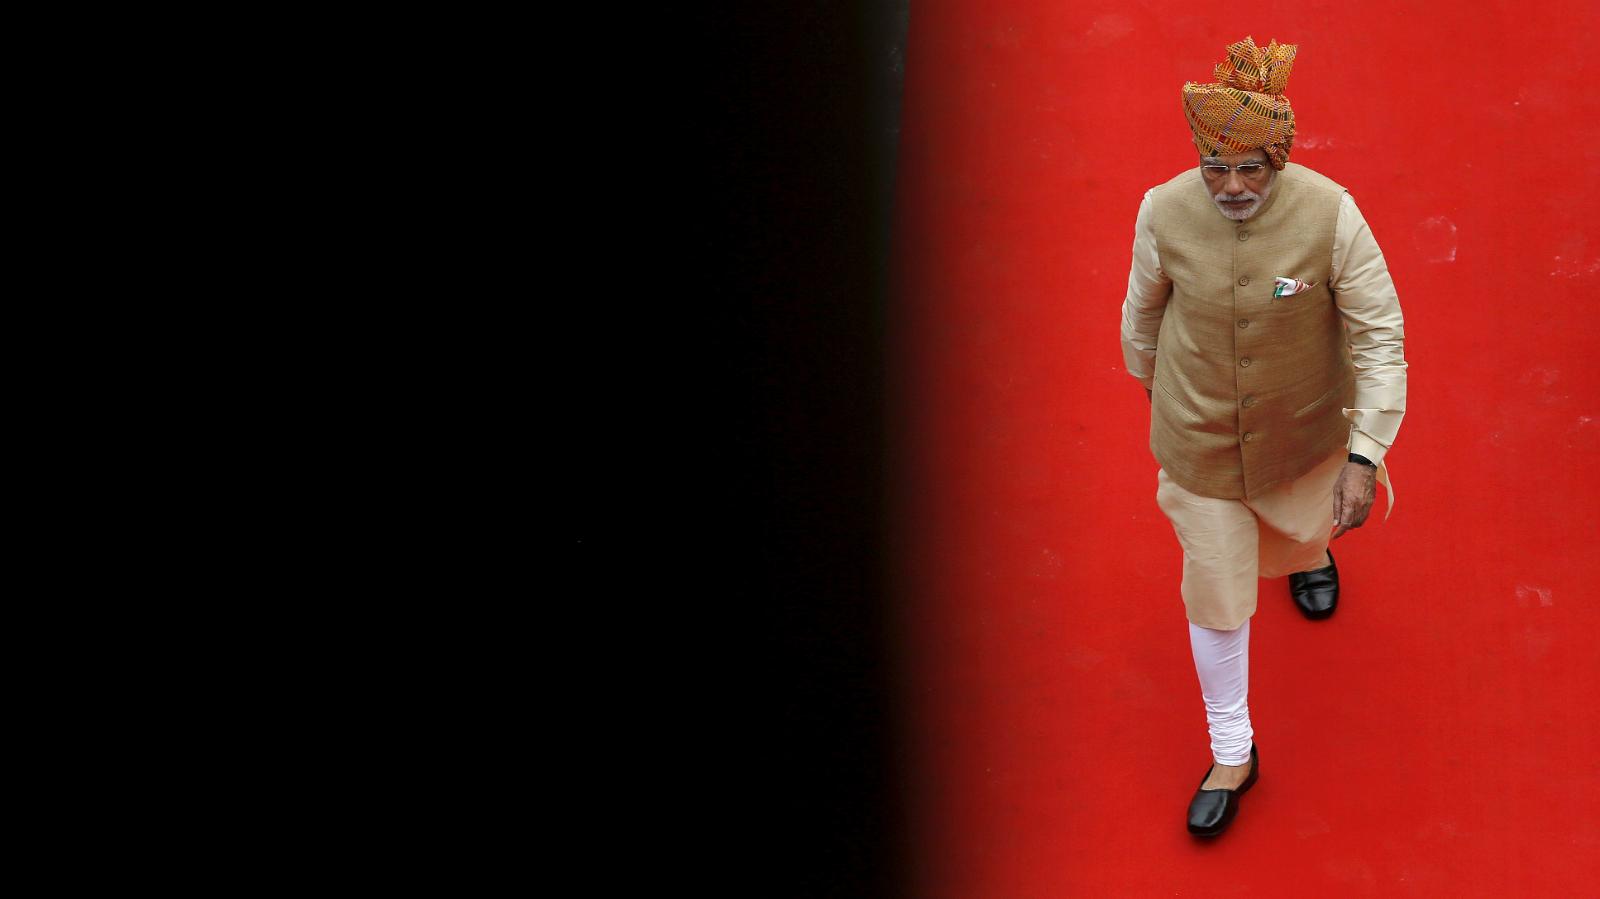 Modi-Assam-India-Reform